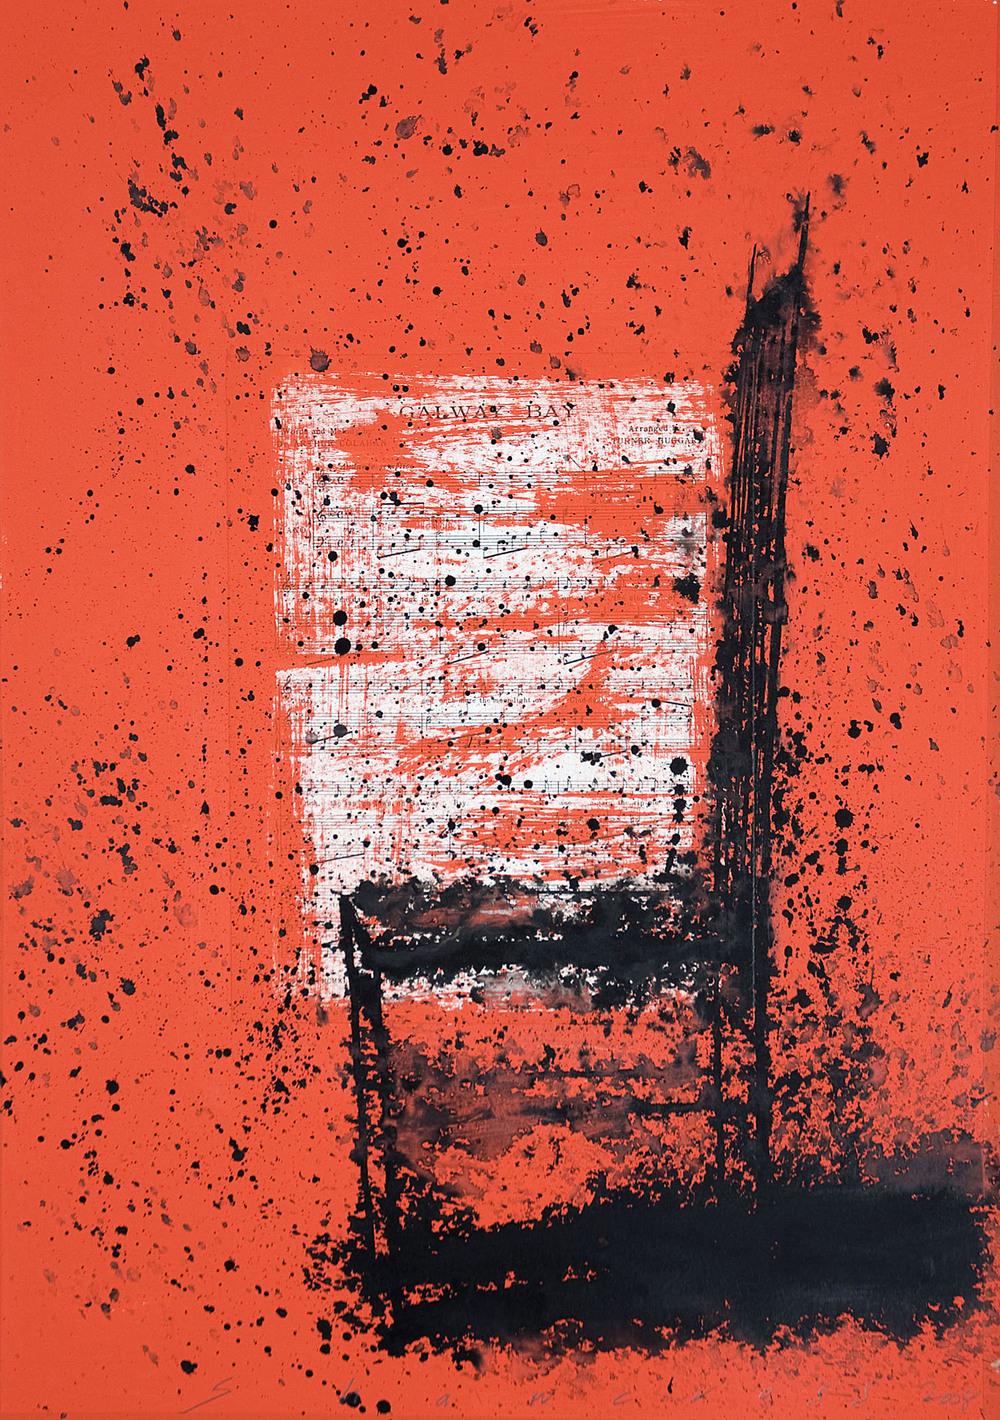 Neil Shawcross_2007_Chair #23_acrylic on paper_63.5 x 46cm.jpg